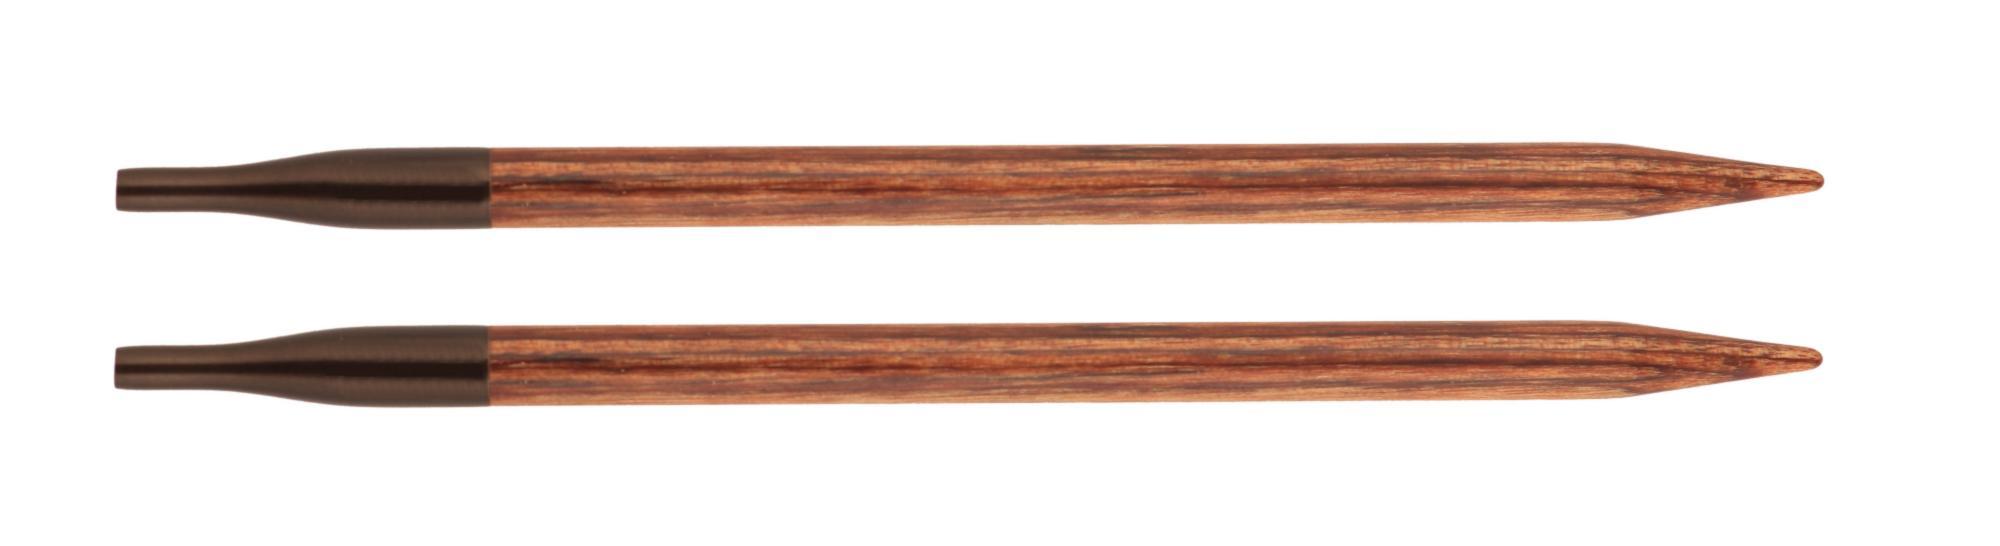 31211 Спицы съемные 7.00 мм Ginger KnitPro